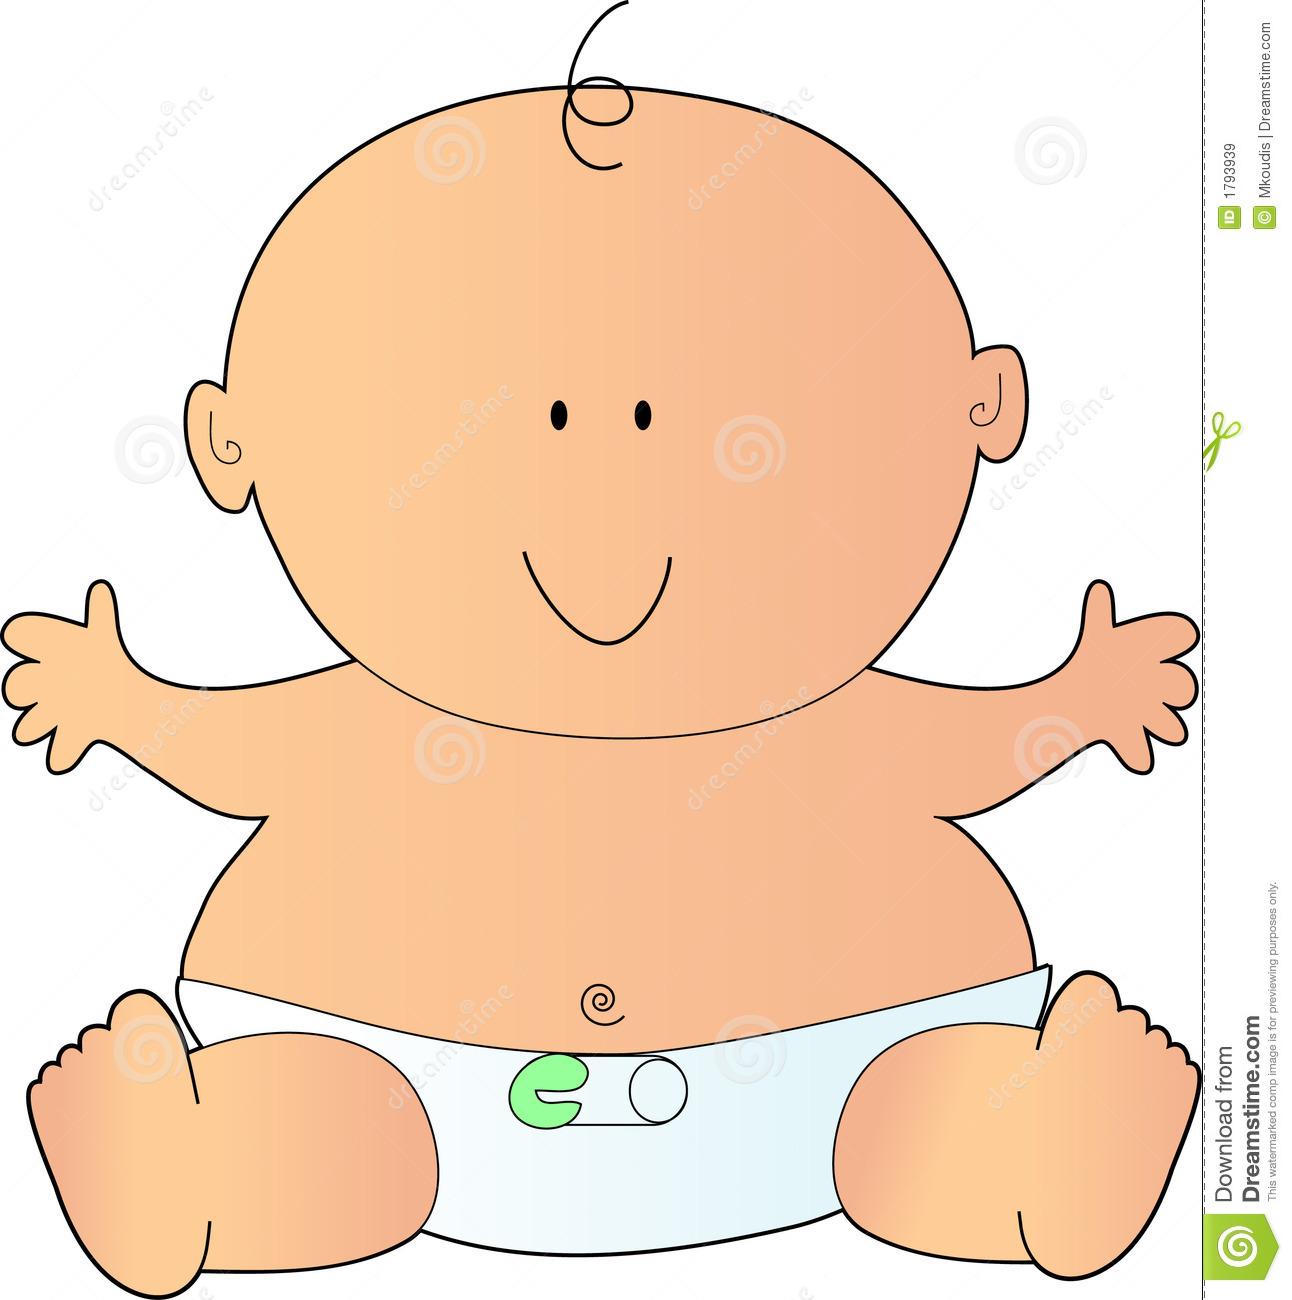 Newborn Baby Royalty Free Stock Images I-Newborn Baby Royalty Free Stock Images Image 1793939-14